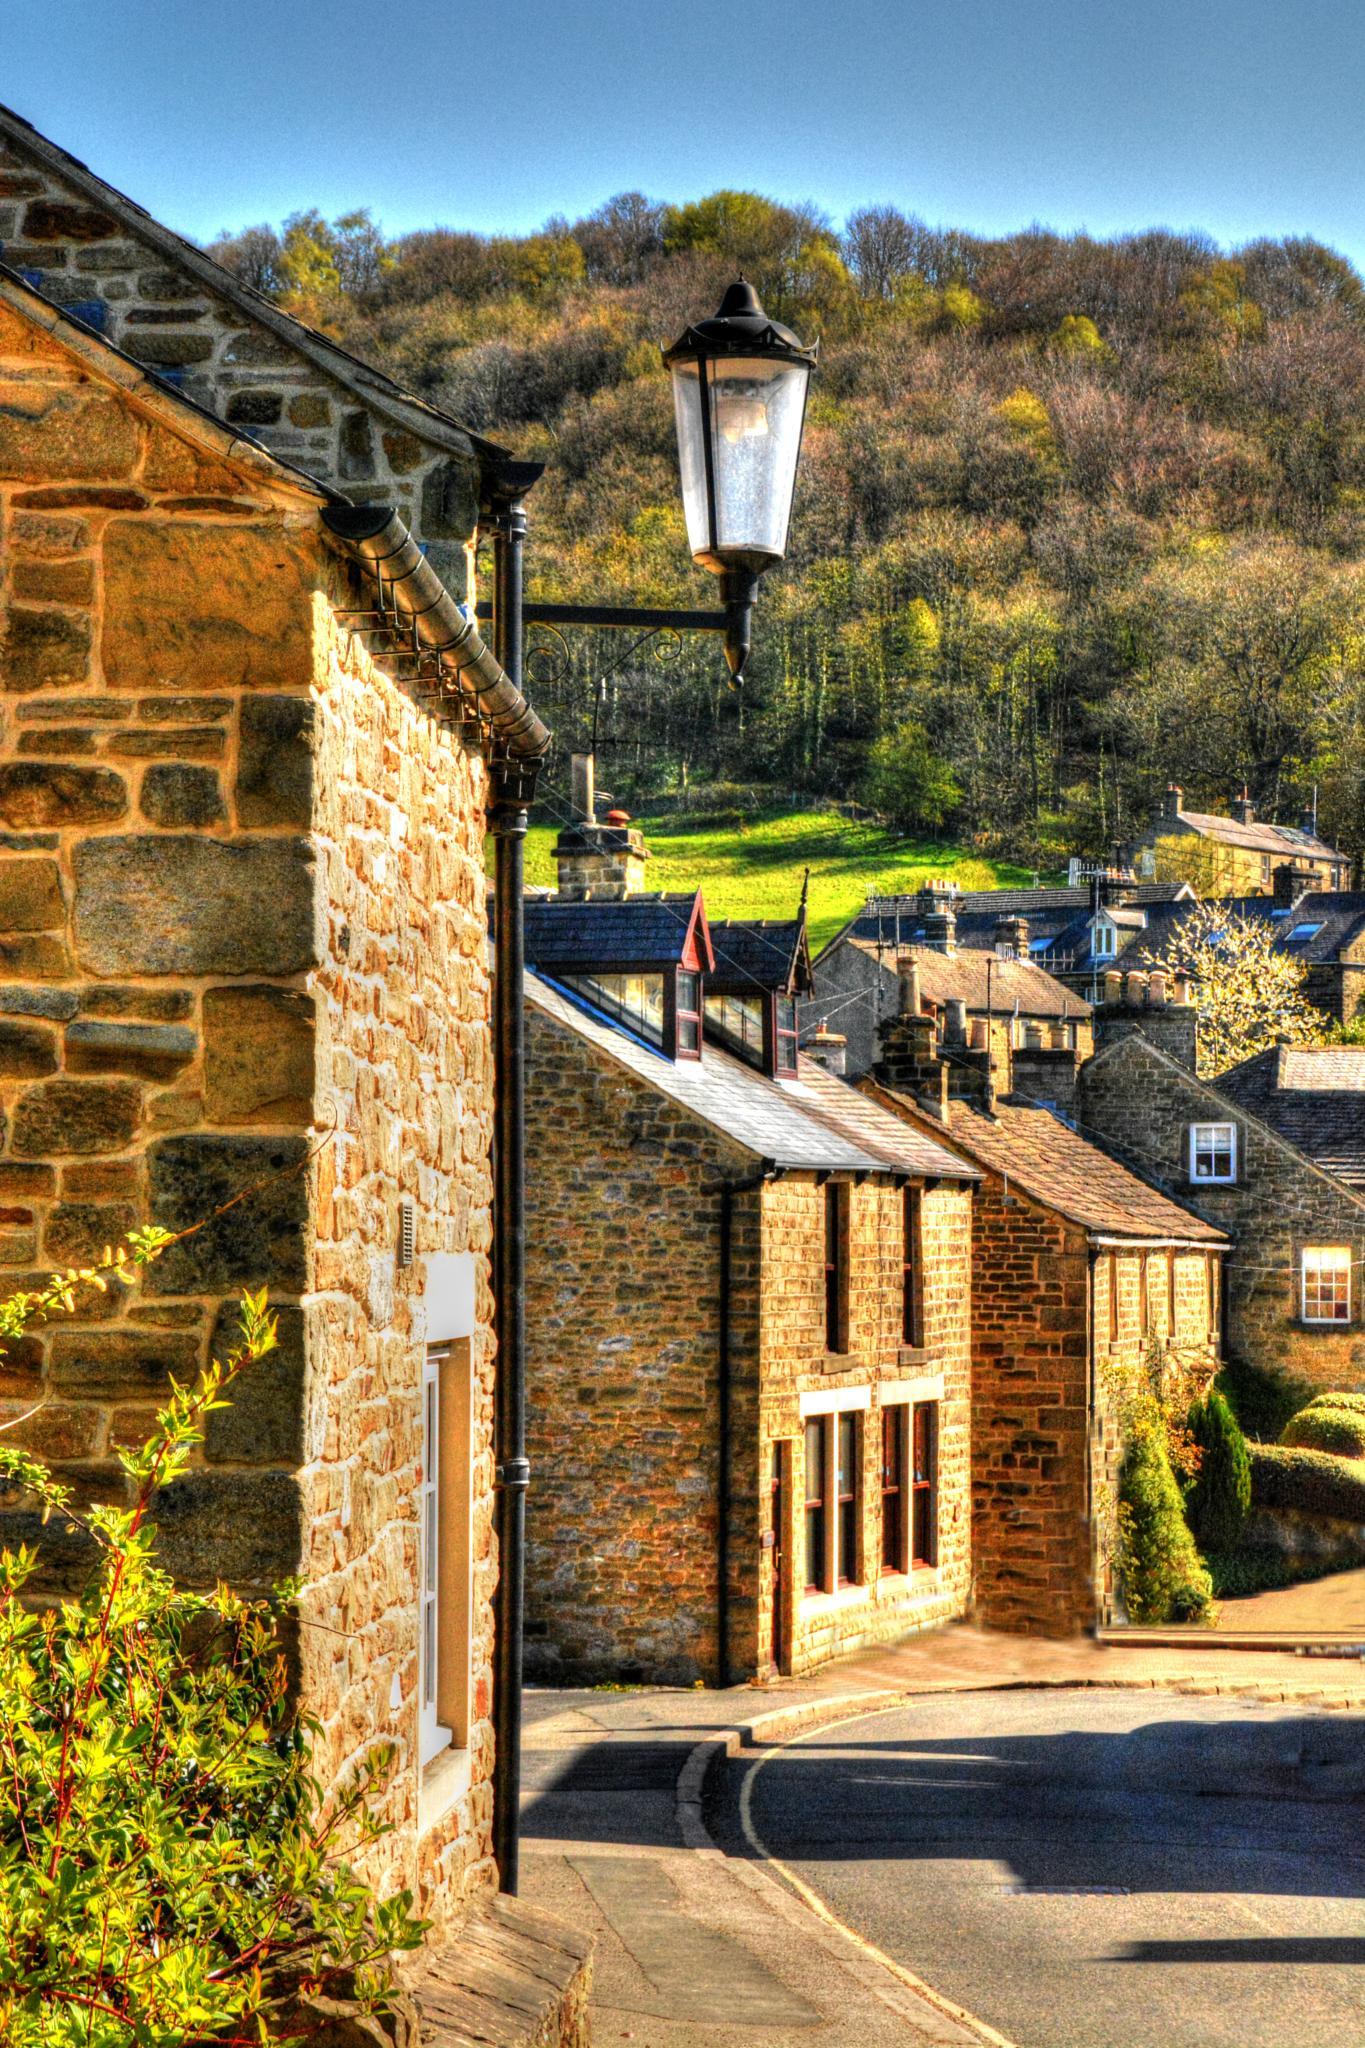 derbyshire village by Stuart Robertshaw Photography